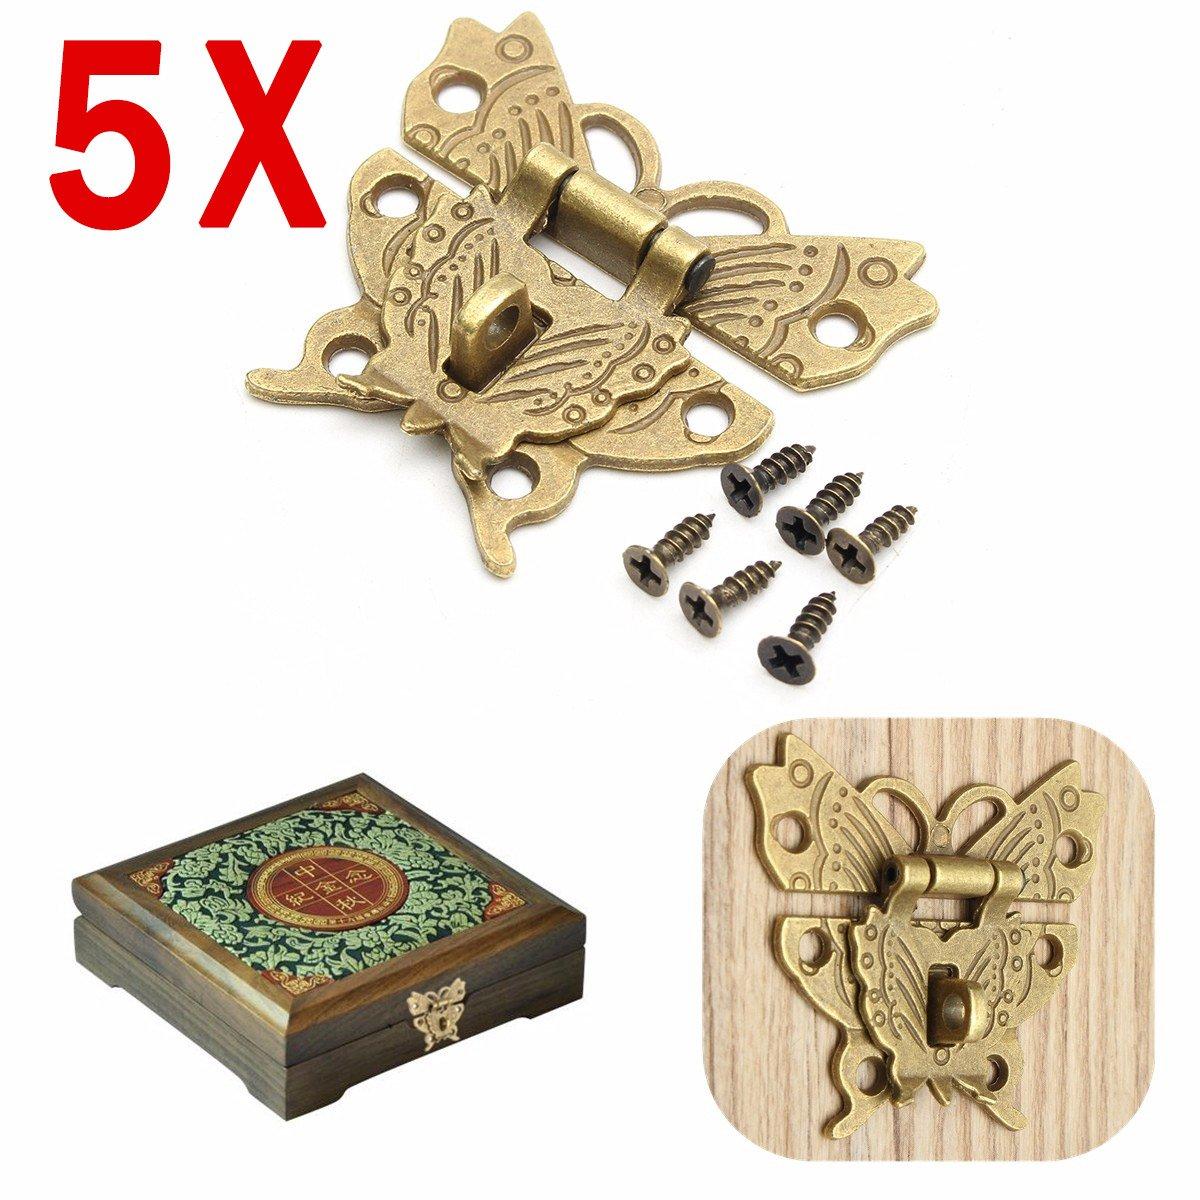 97mmx73mm Suitcase Jewelry Box Hasp Latch Lock Antique Bronze Tone TOOGOO Suitcase Latch Lock R